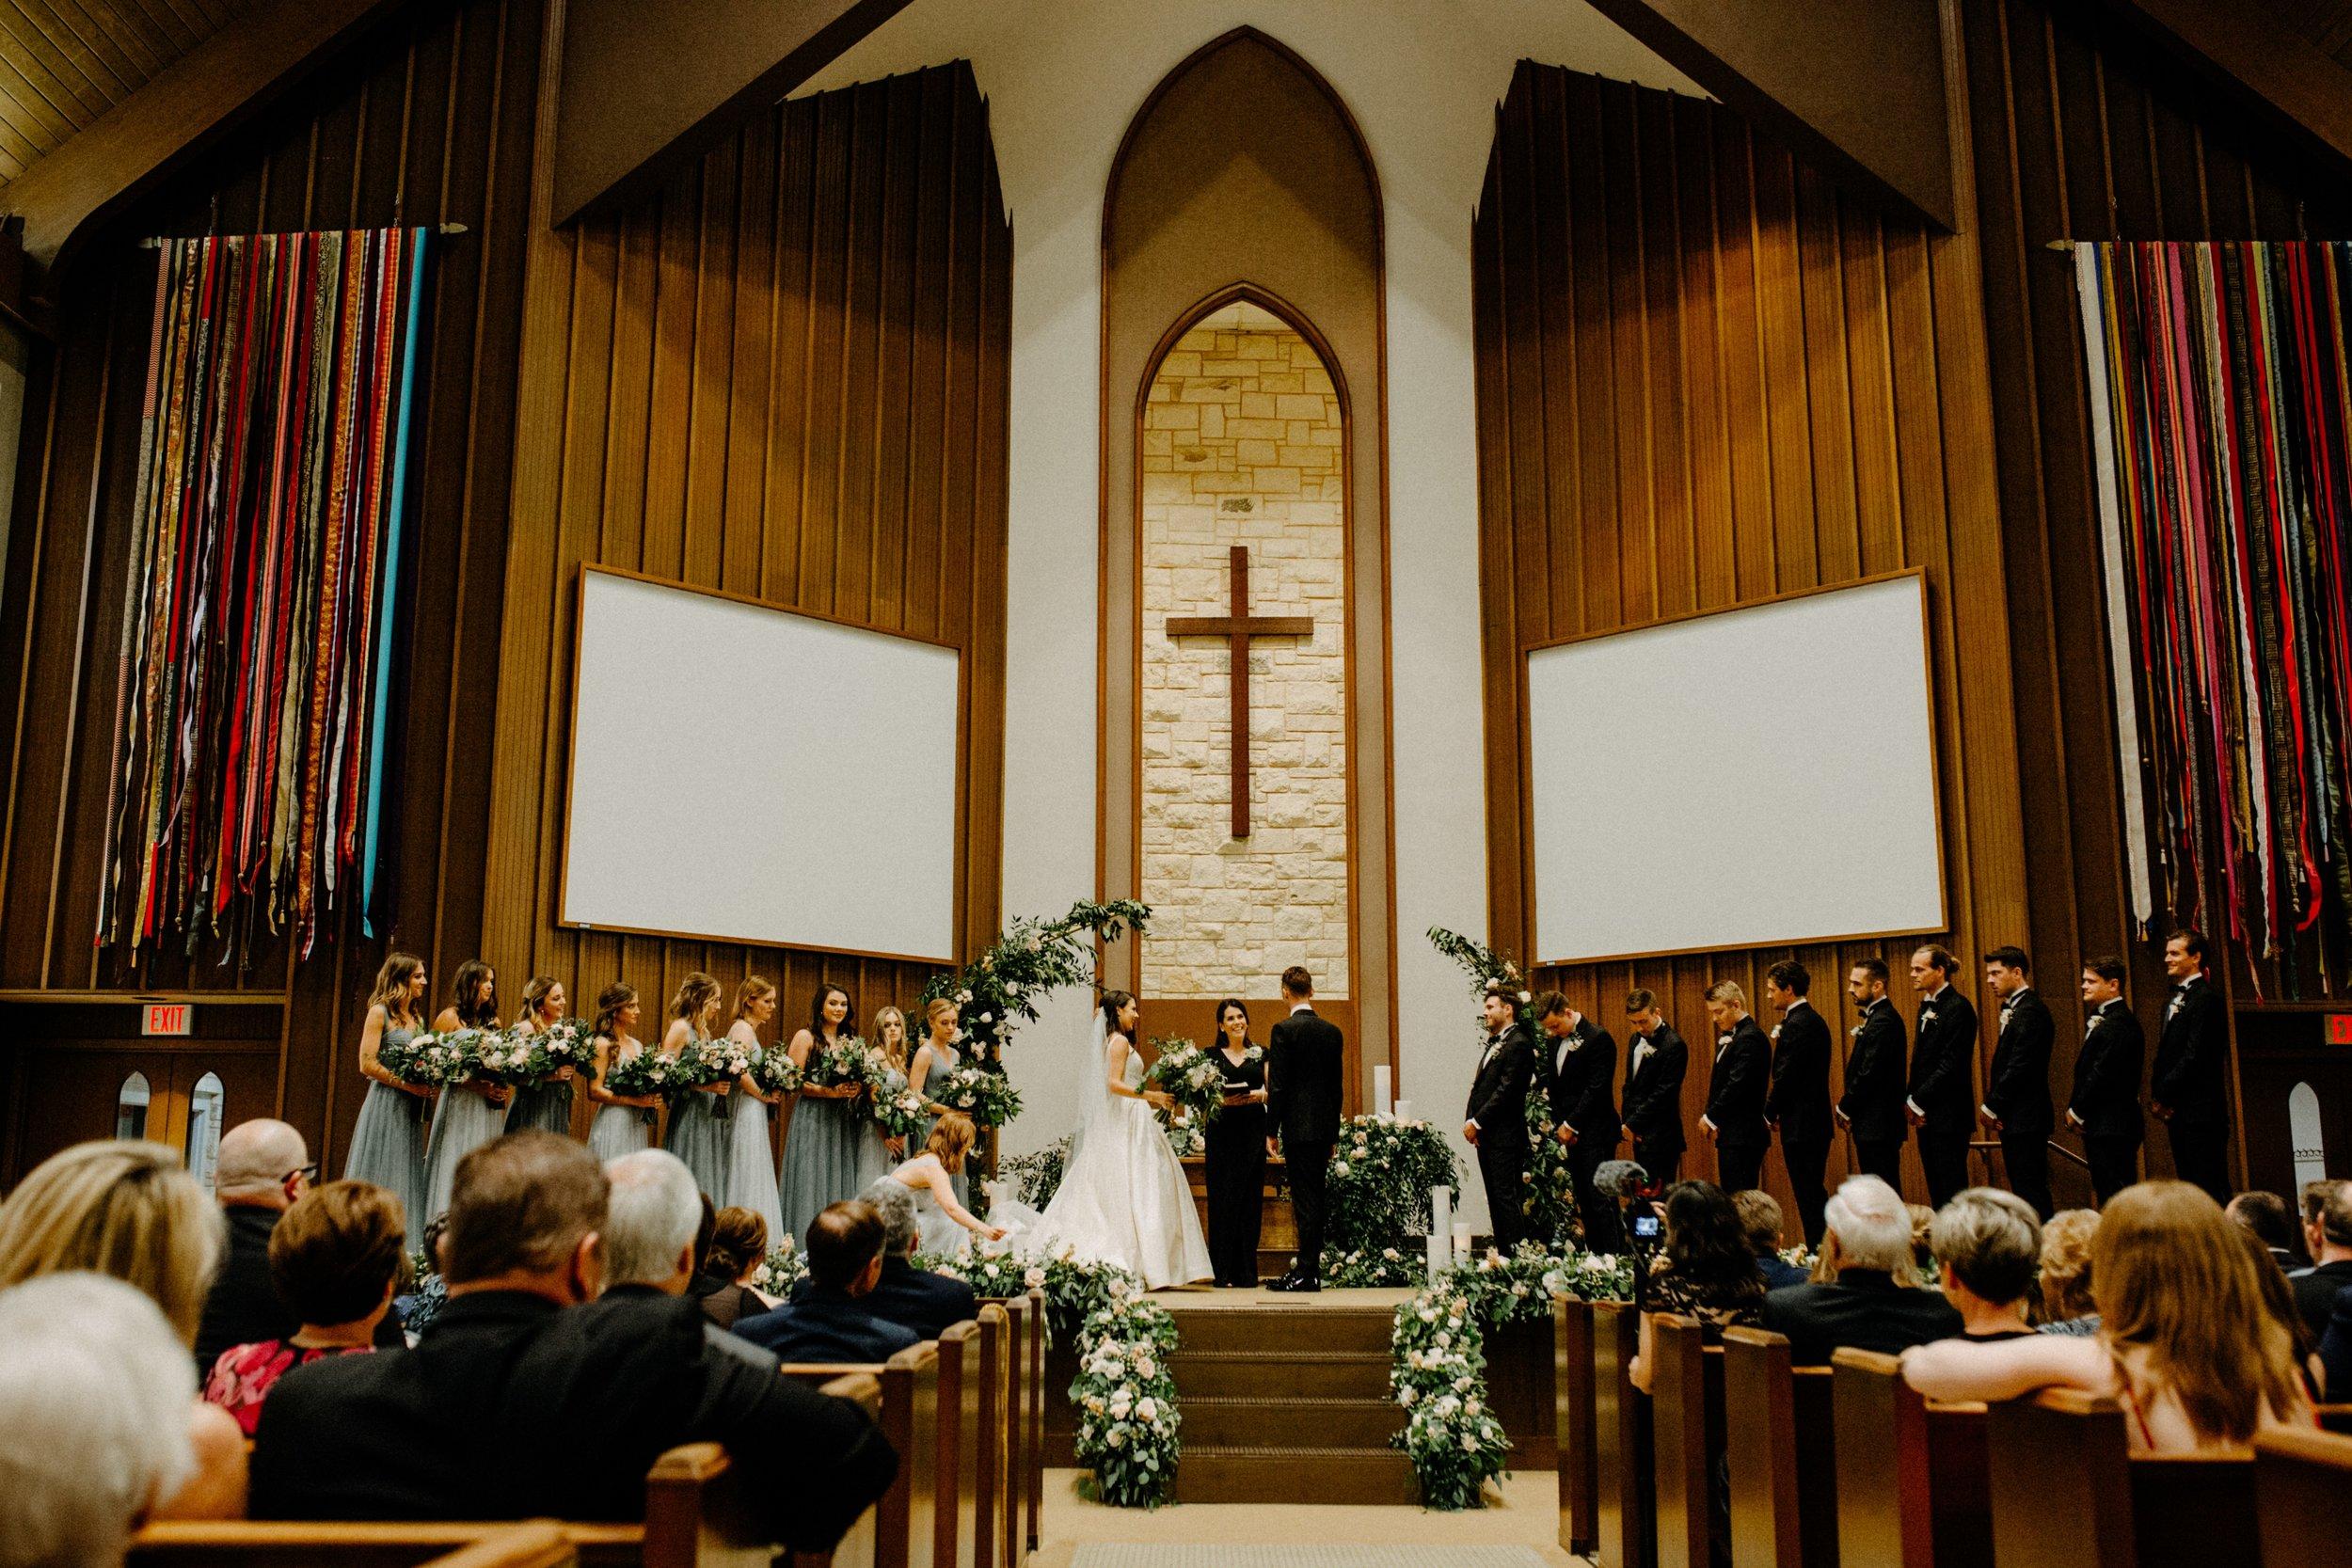 st-anthony-hotel-wedding-photography-10070san-antonio.JPG